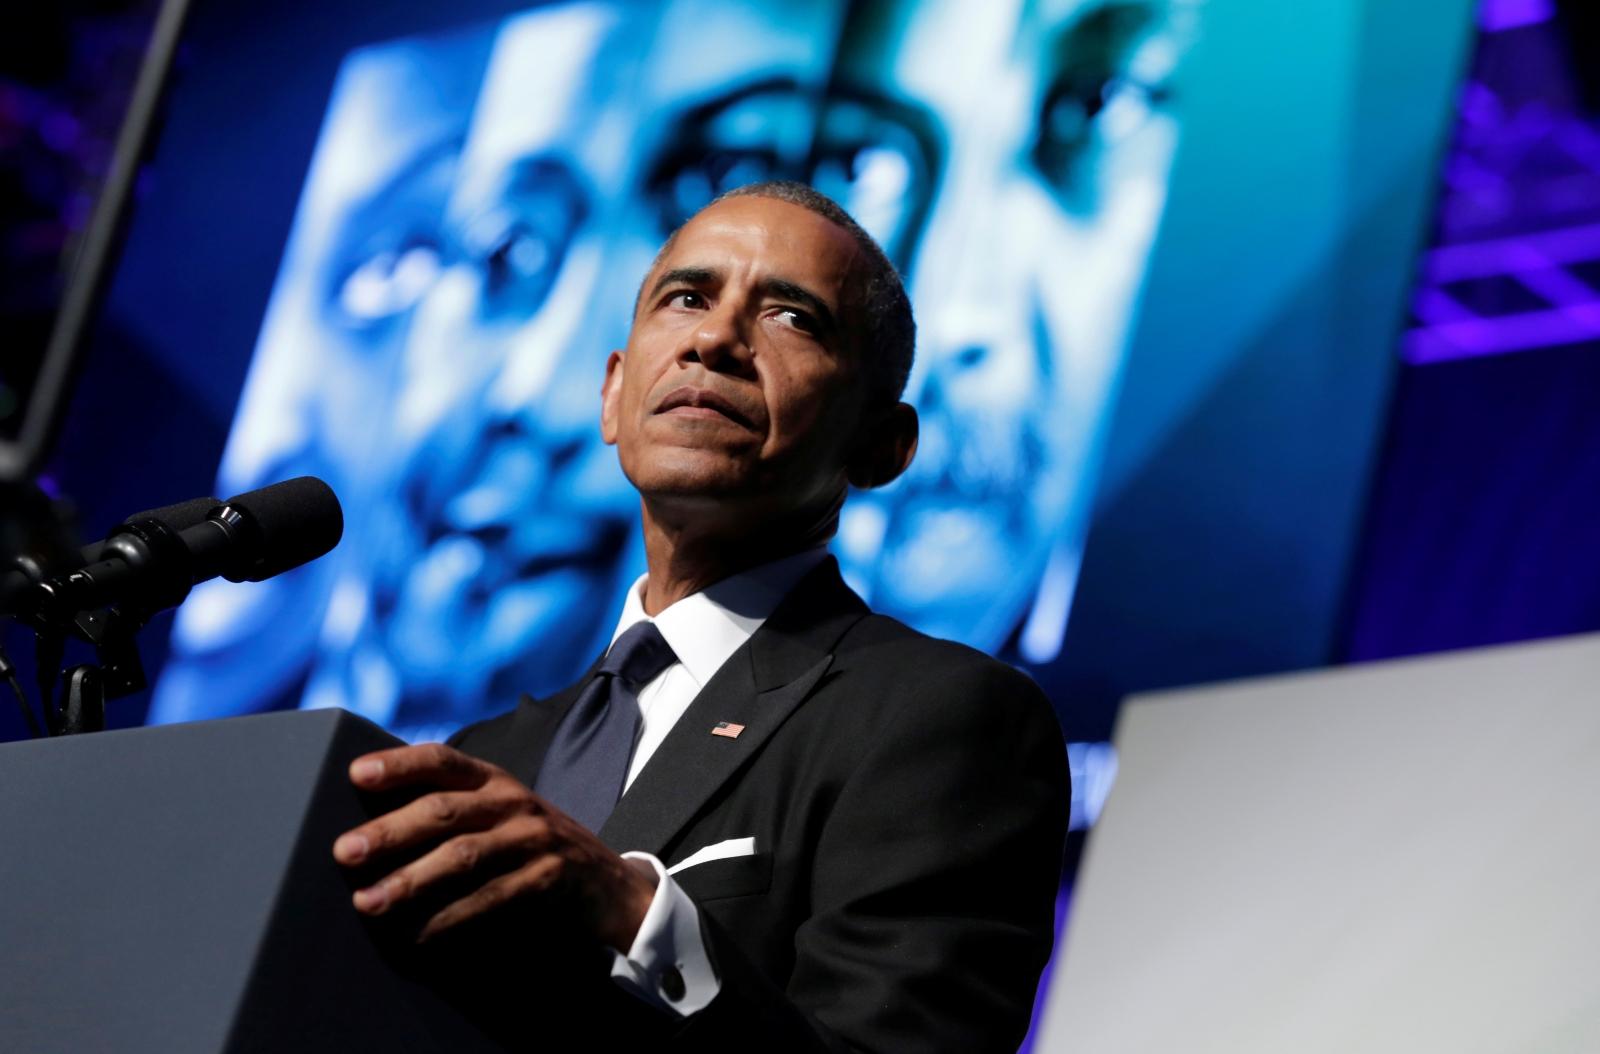 Vote For Barack Obama Essay Persuasive Essay About Barack Obama English Model Essays also Companies That Help Write Business Plans  Ap English Essays